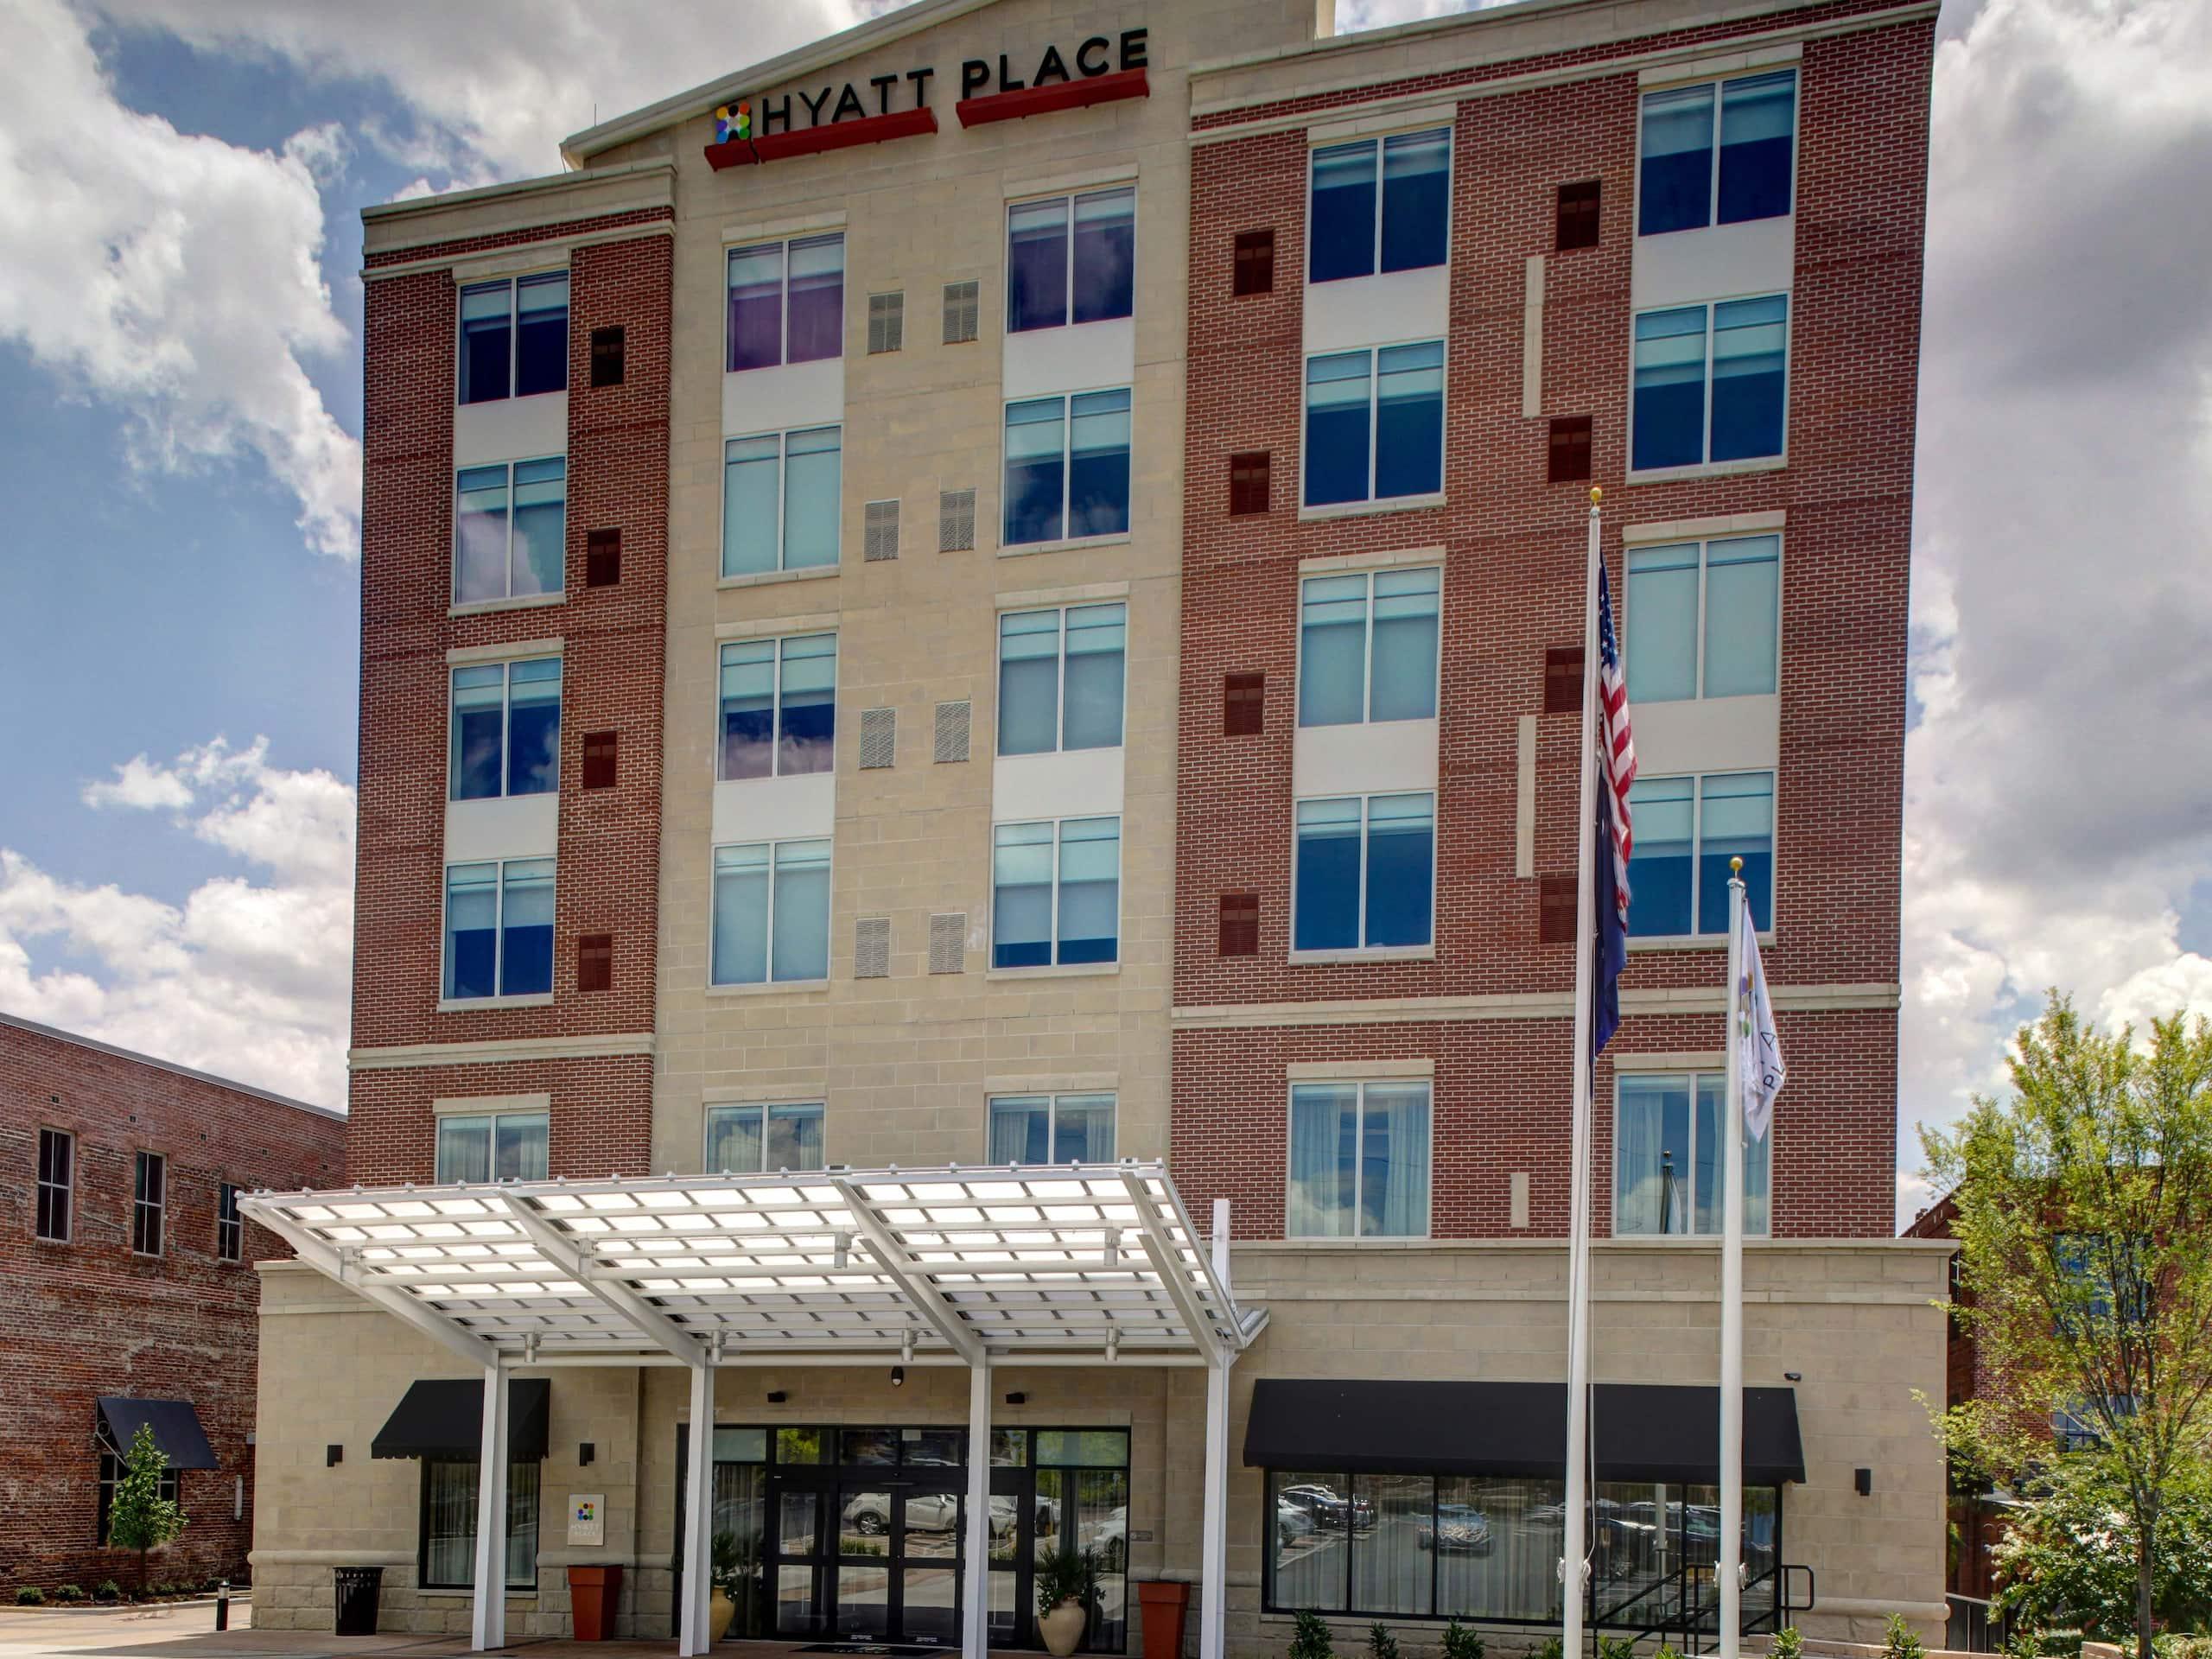 Cozy Hotel Near University Of South Carolina Hyatt Place Columbia Downtown The Vista